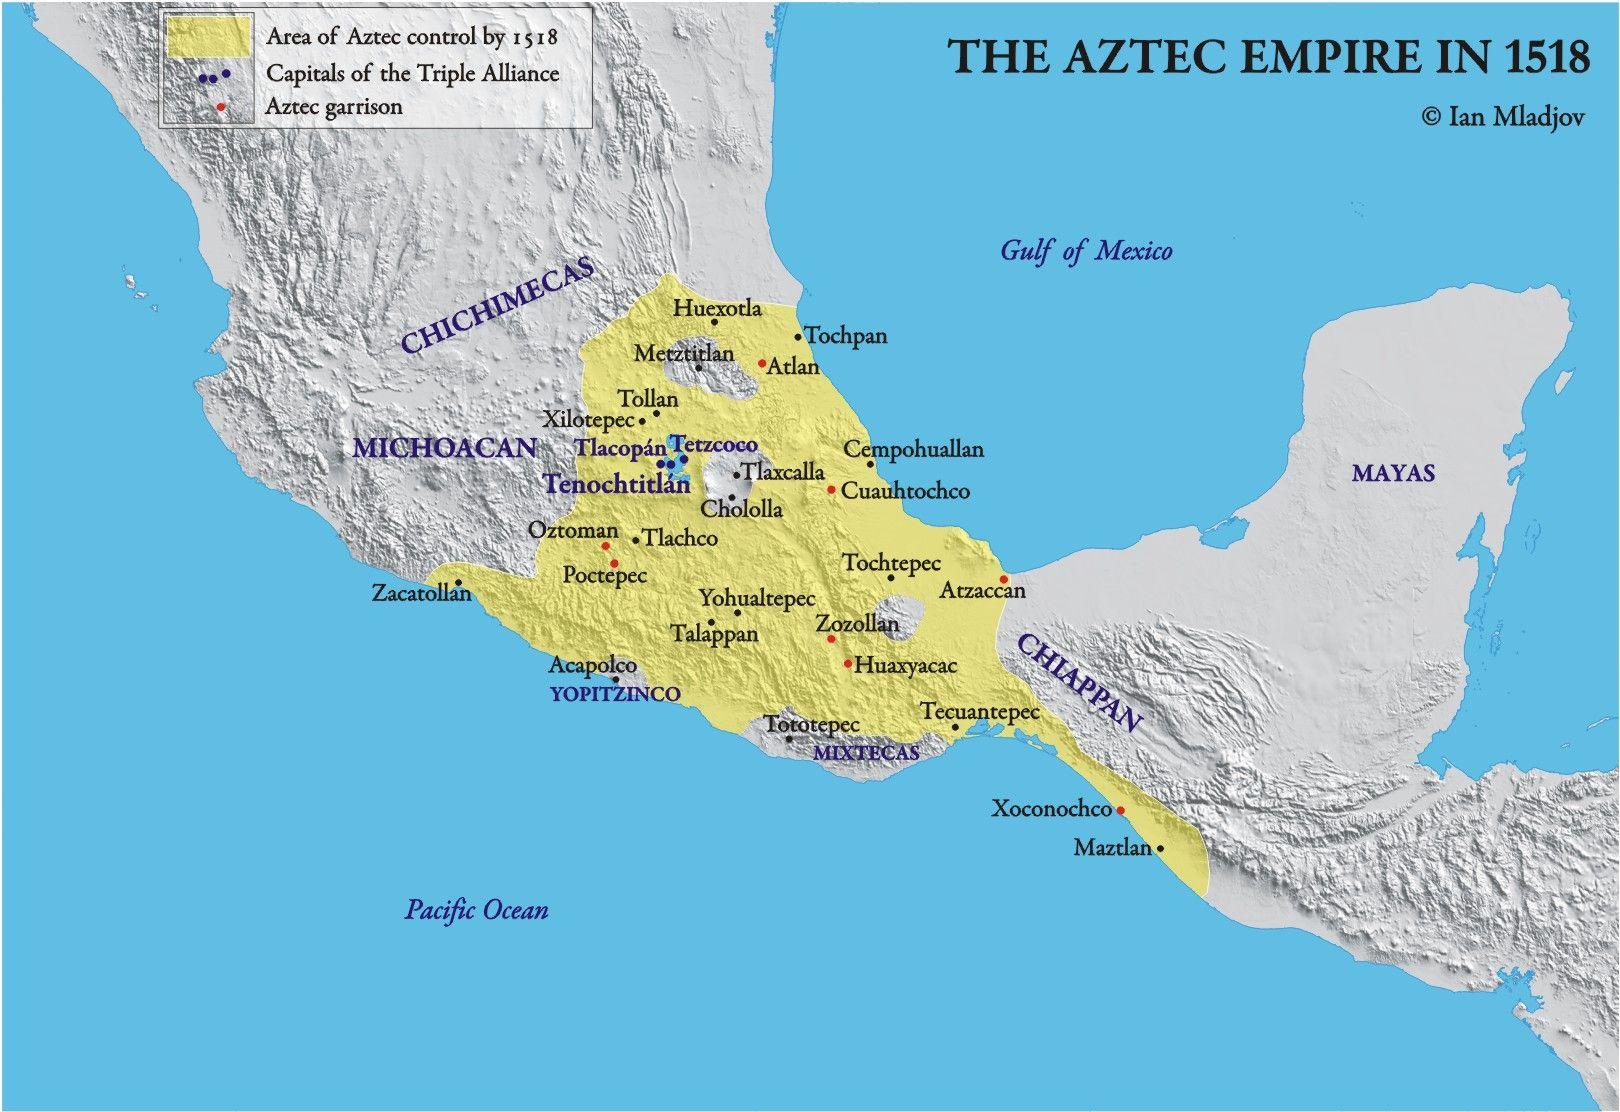 Pin by L. J. Wilson Enterprises LLC on The Aztec Empire